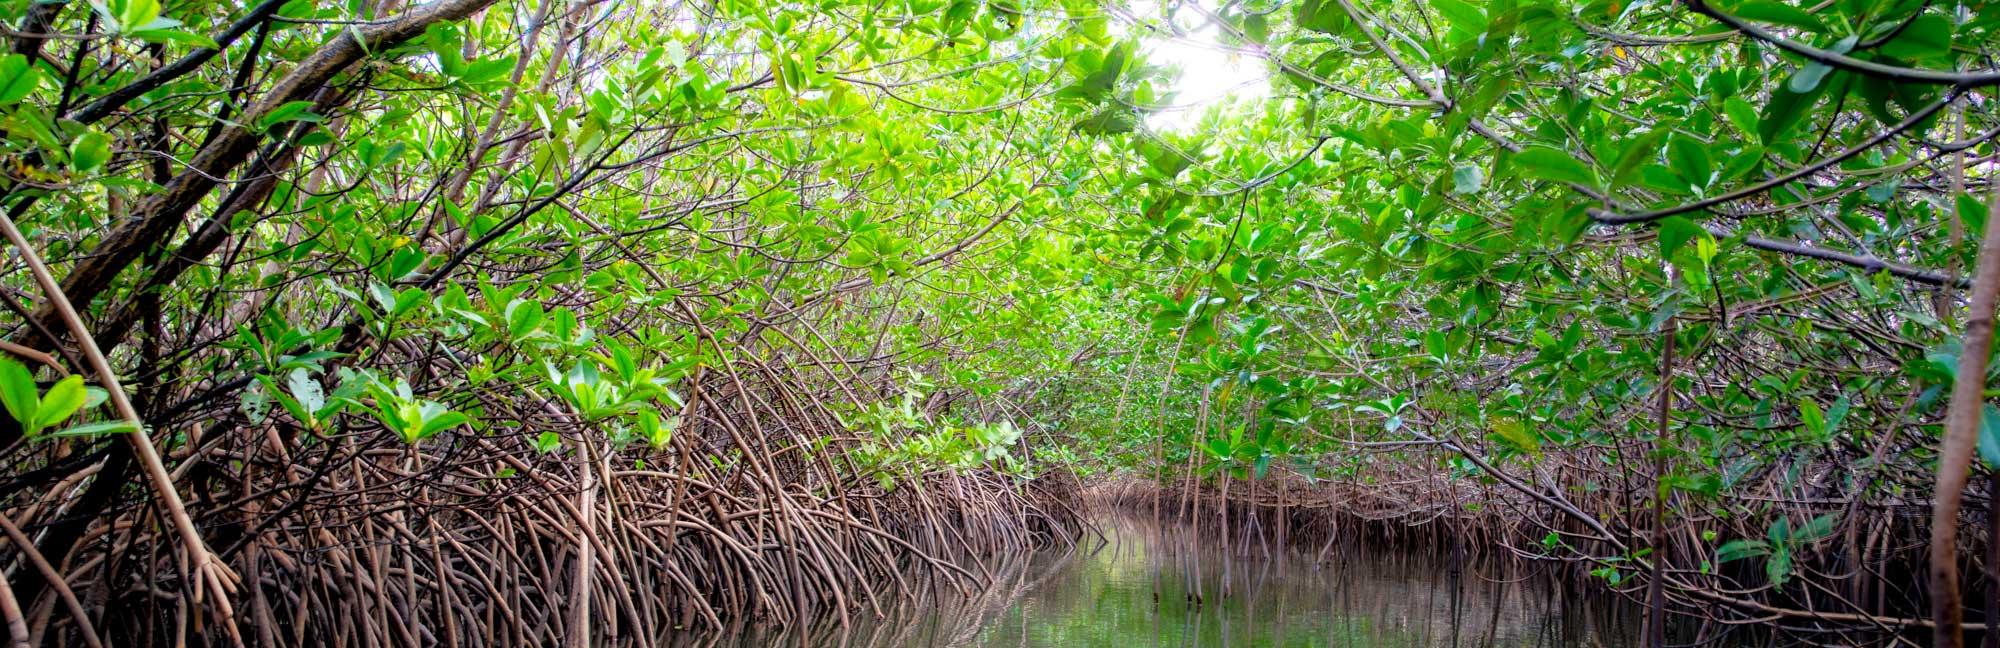 Banner image of a mangrove in juniper inlet.